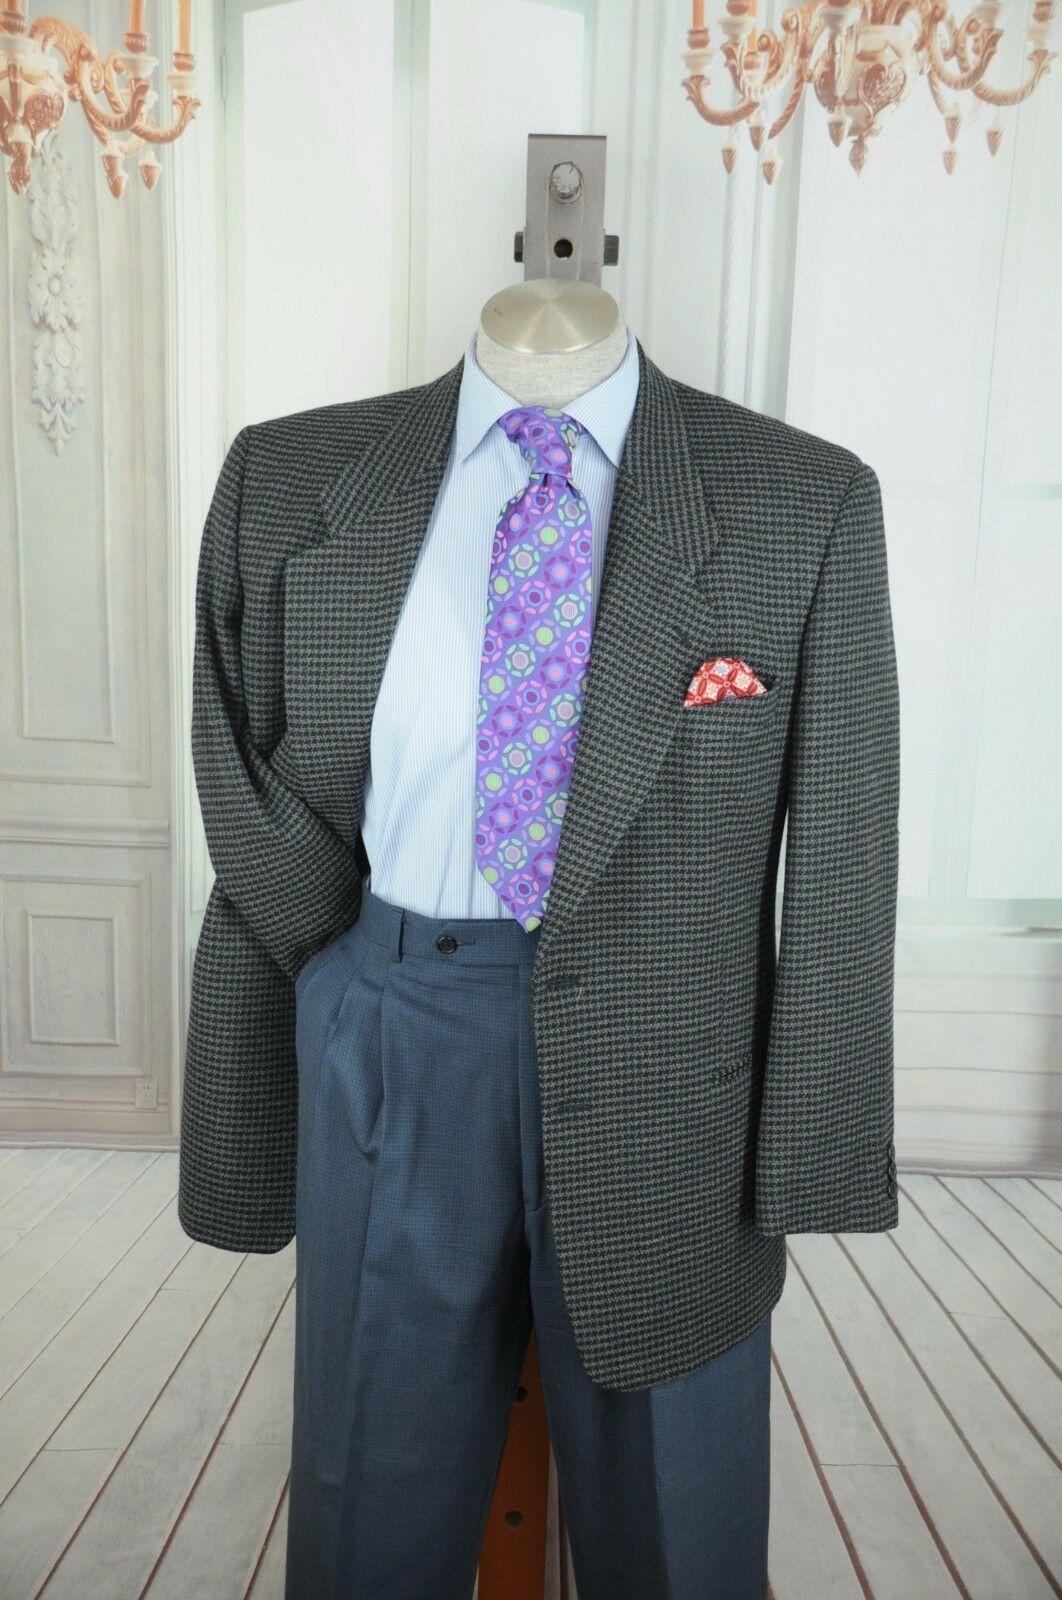 Giorgio Armani MANI Men's Black & Gray Wool Blend Sport Coat Blazer 40R 40 R